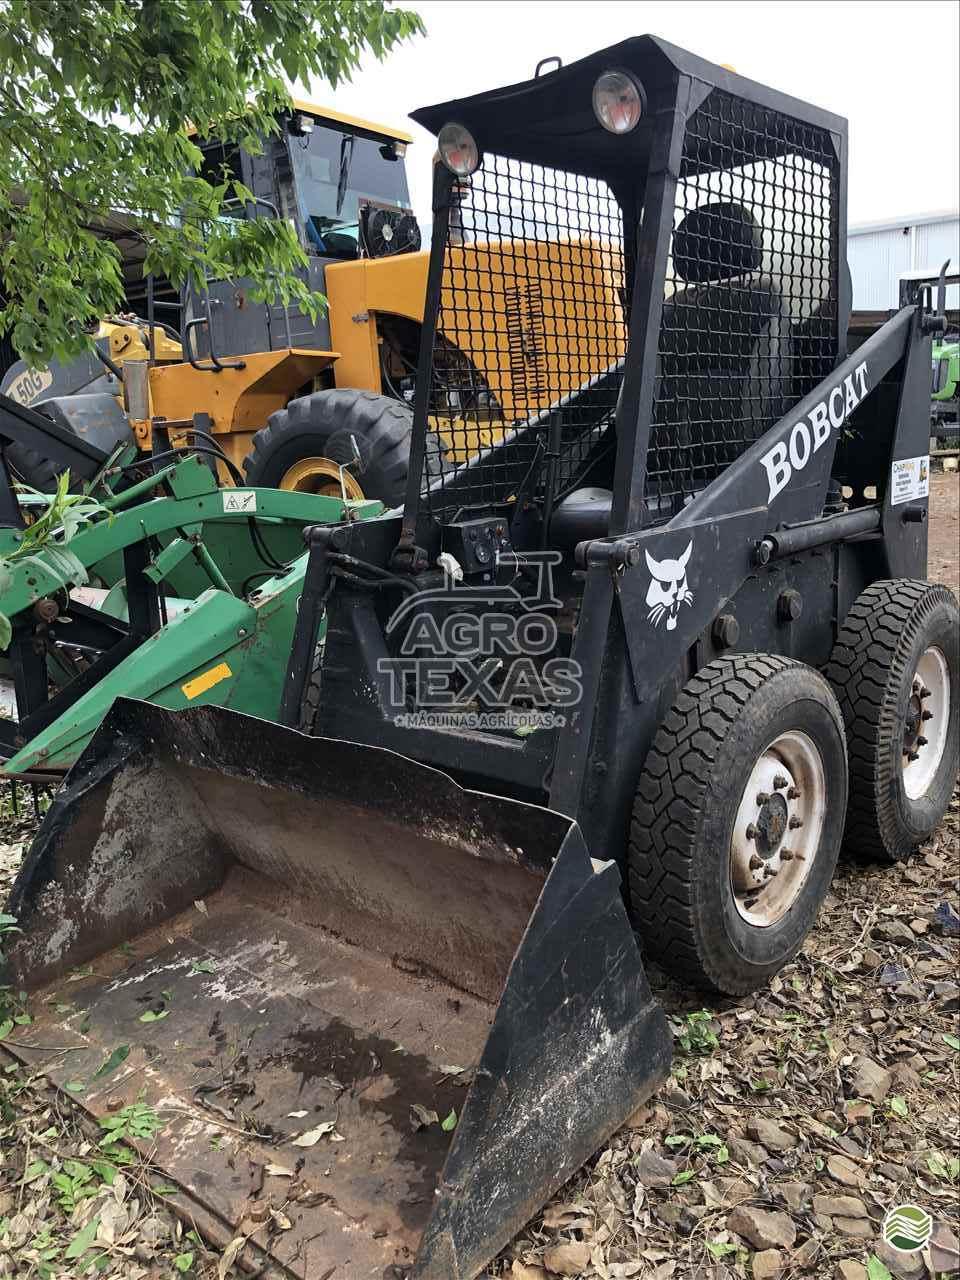 MINI CARREGADEIRA BOBCAT 711 Agro Texas Máquinas Agrícolas VITORINO PARANÁ PR